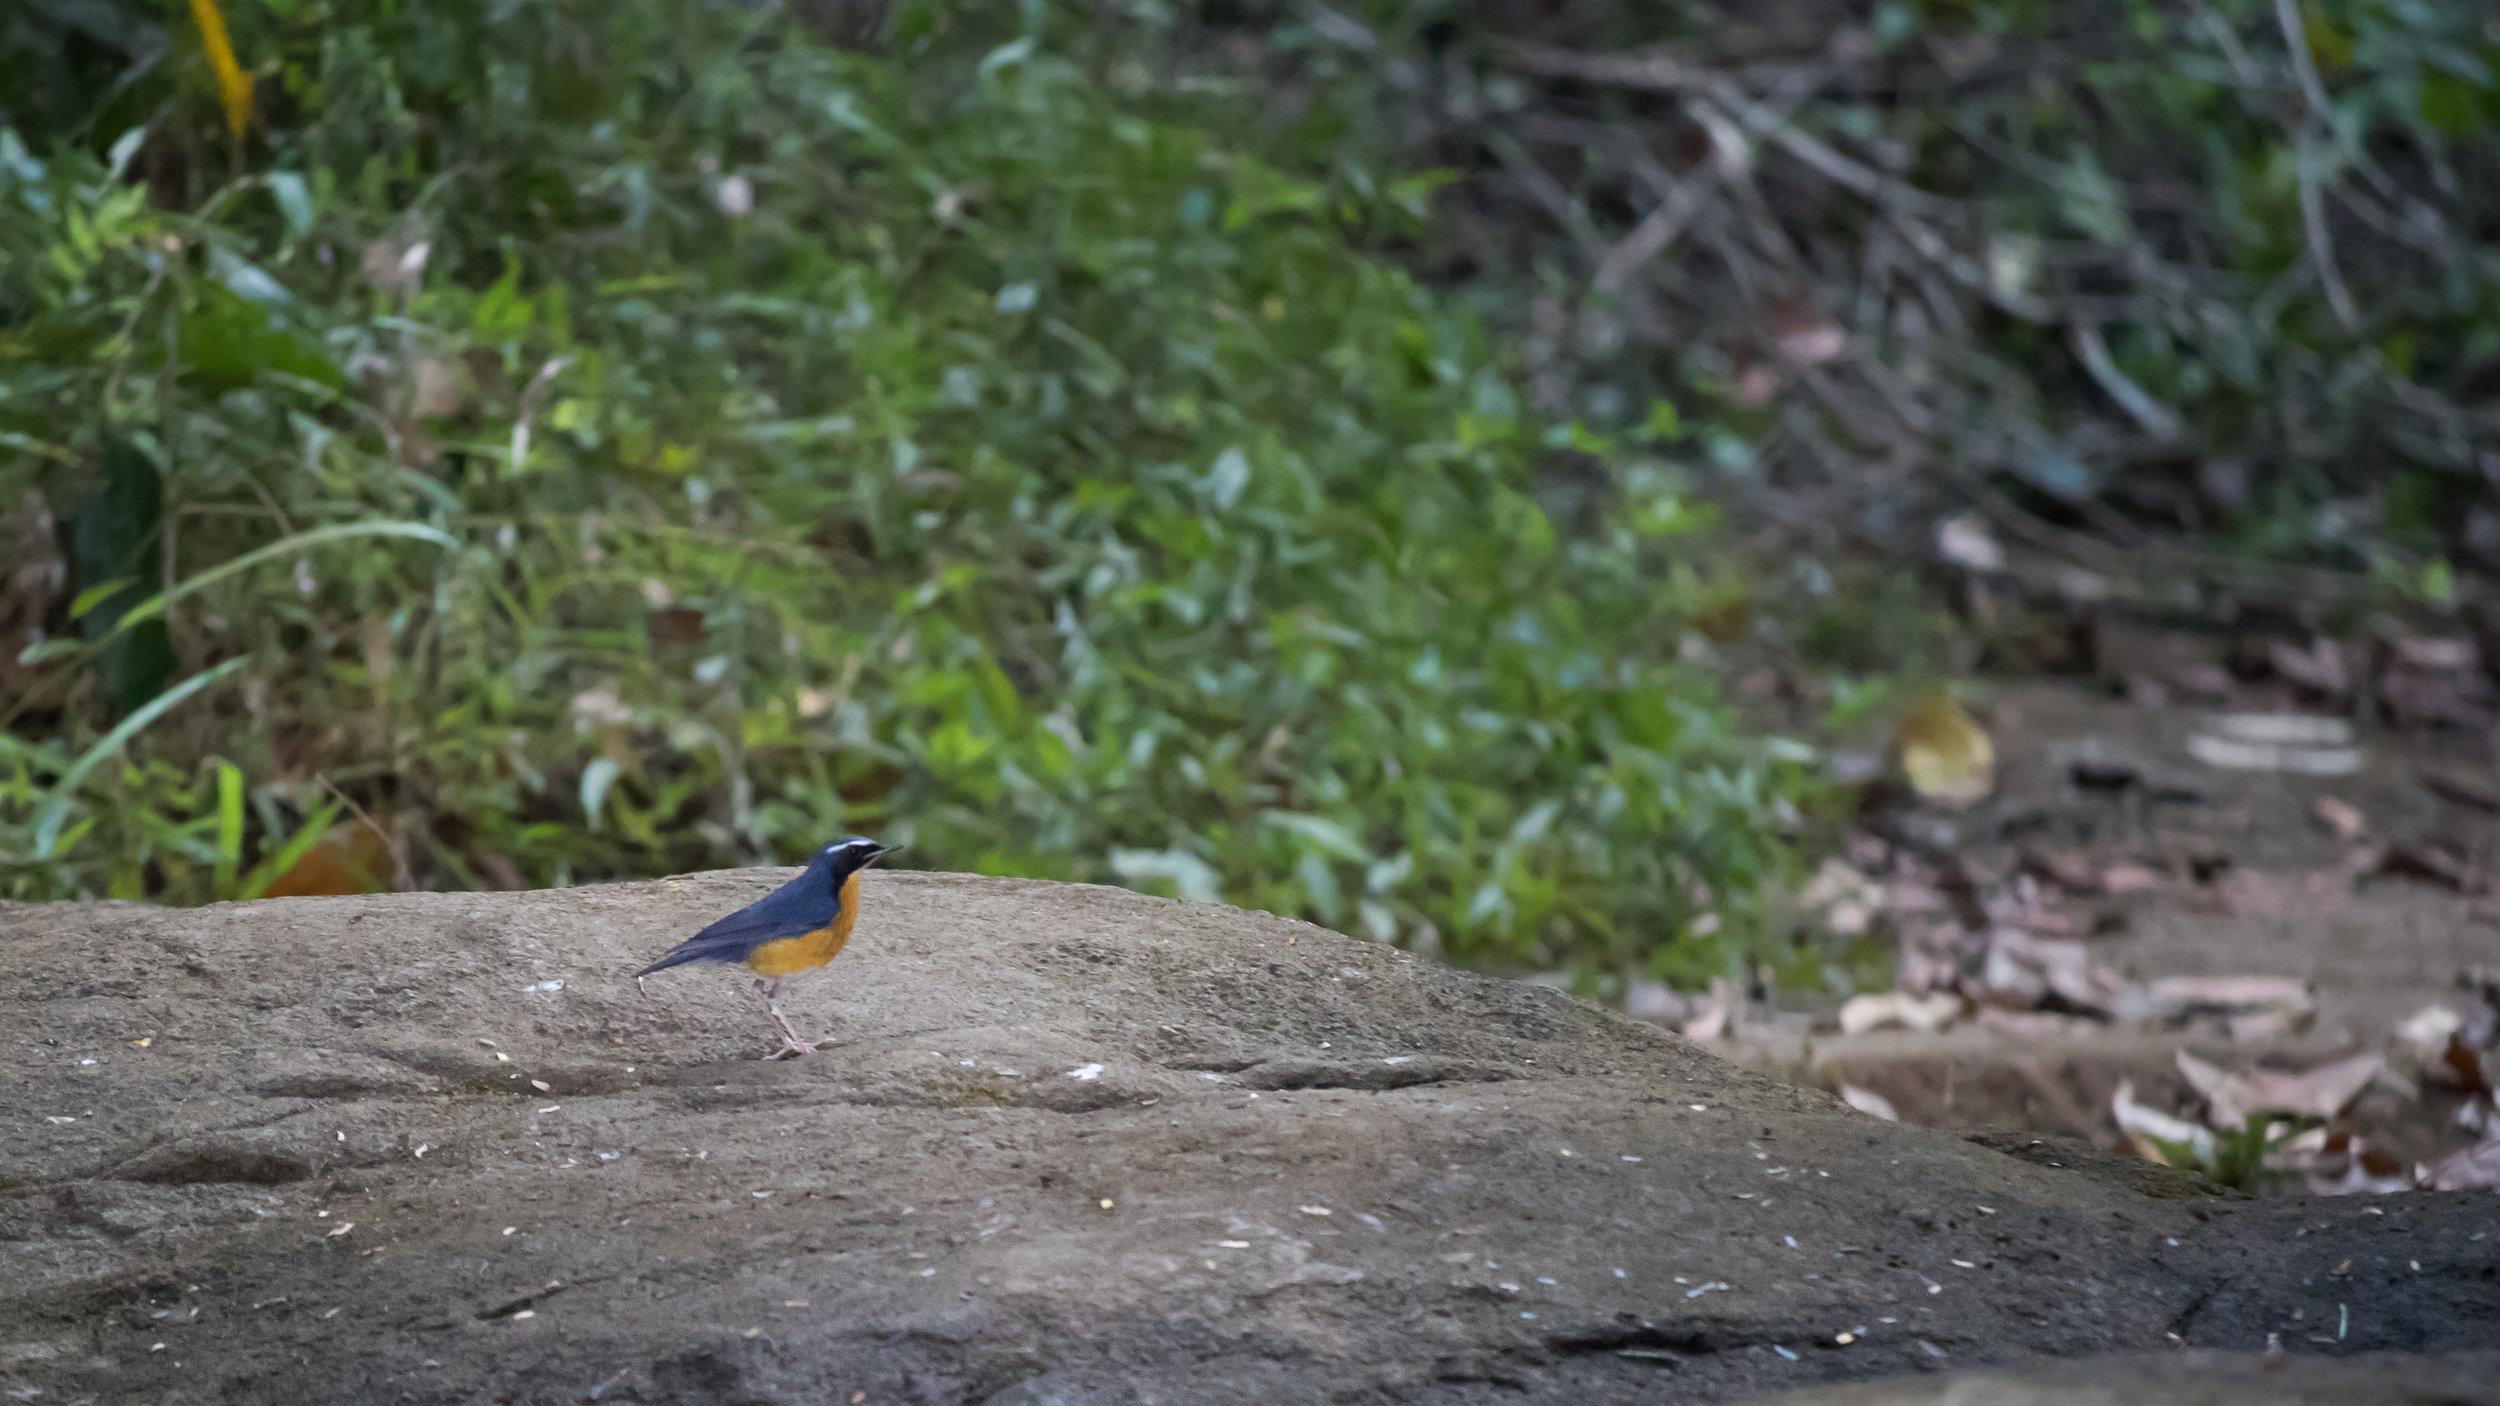 Indian Blue Robin (Larvivora brunnea) near Thattekad Bird Sanctuary, Kerala, India. February 2015. Not baited. Not called in.